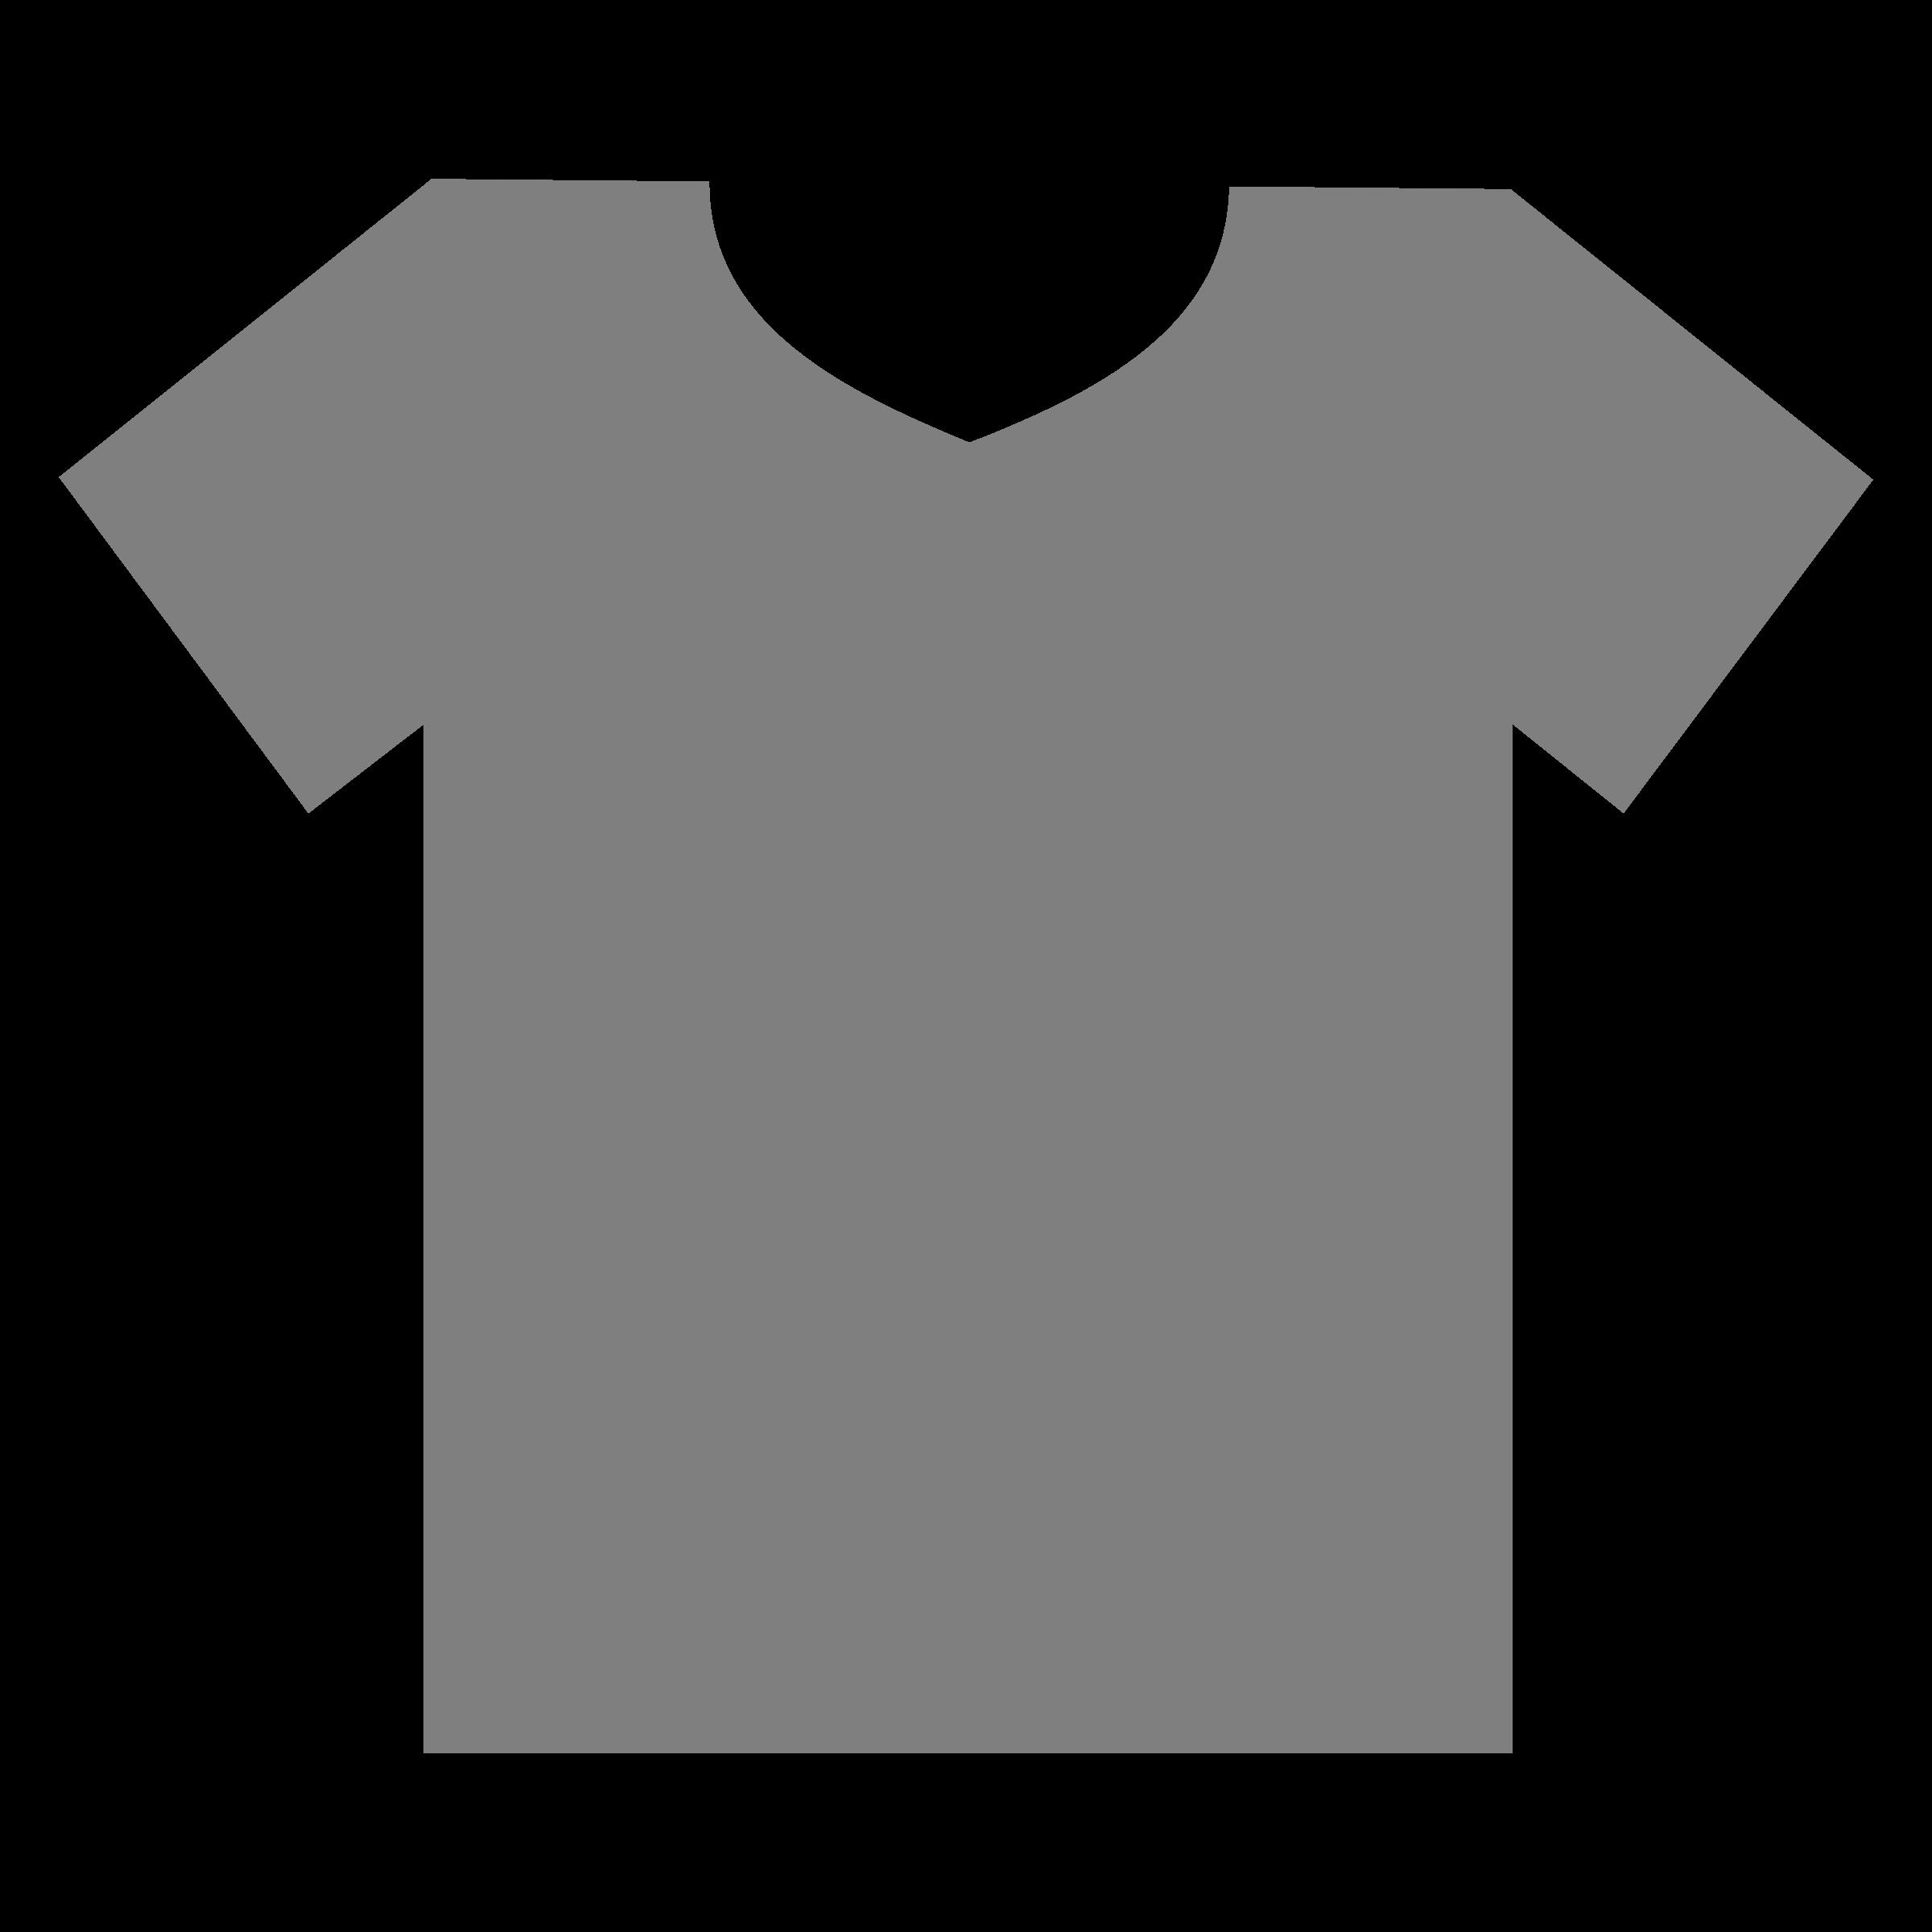 BIG IMAGE (PNG) - Tshirt PNG Outline